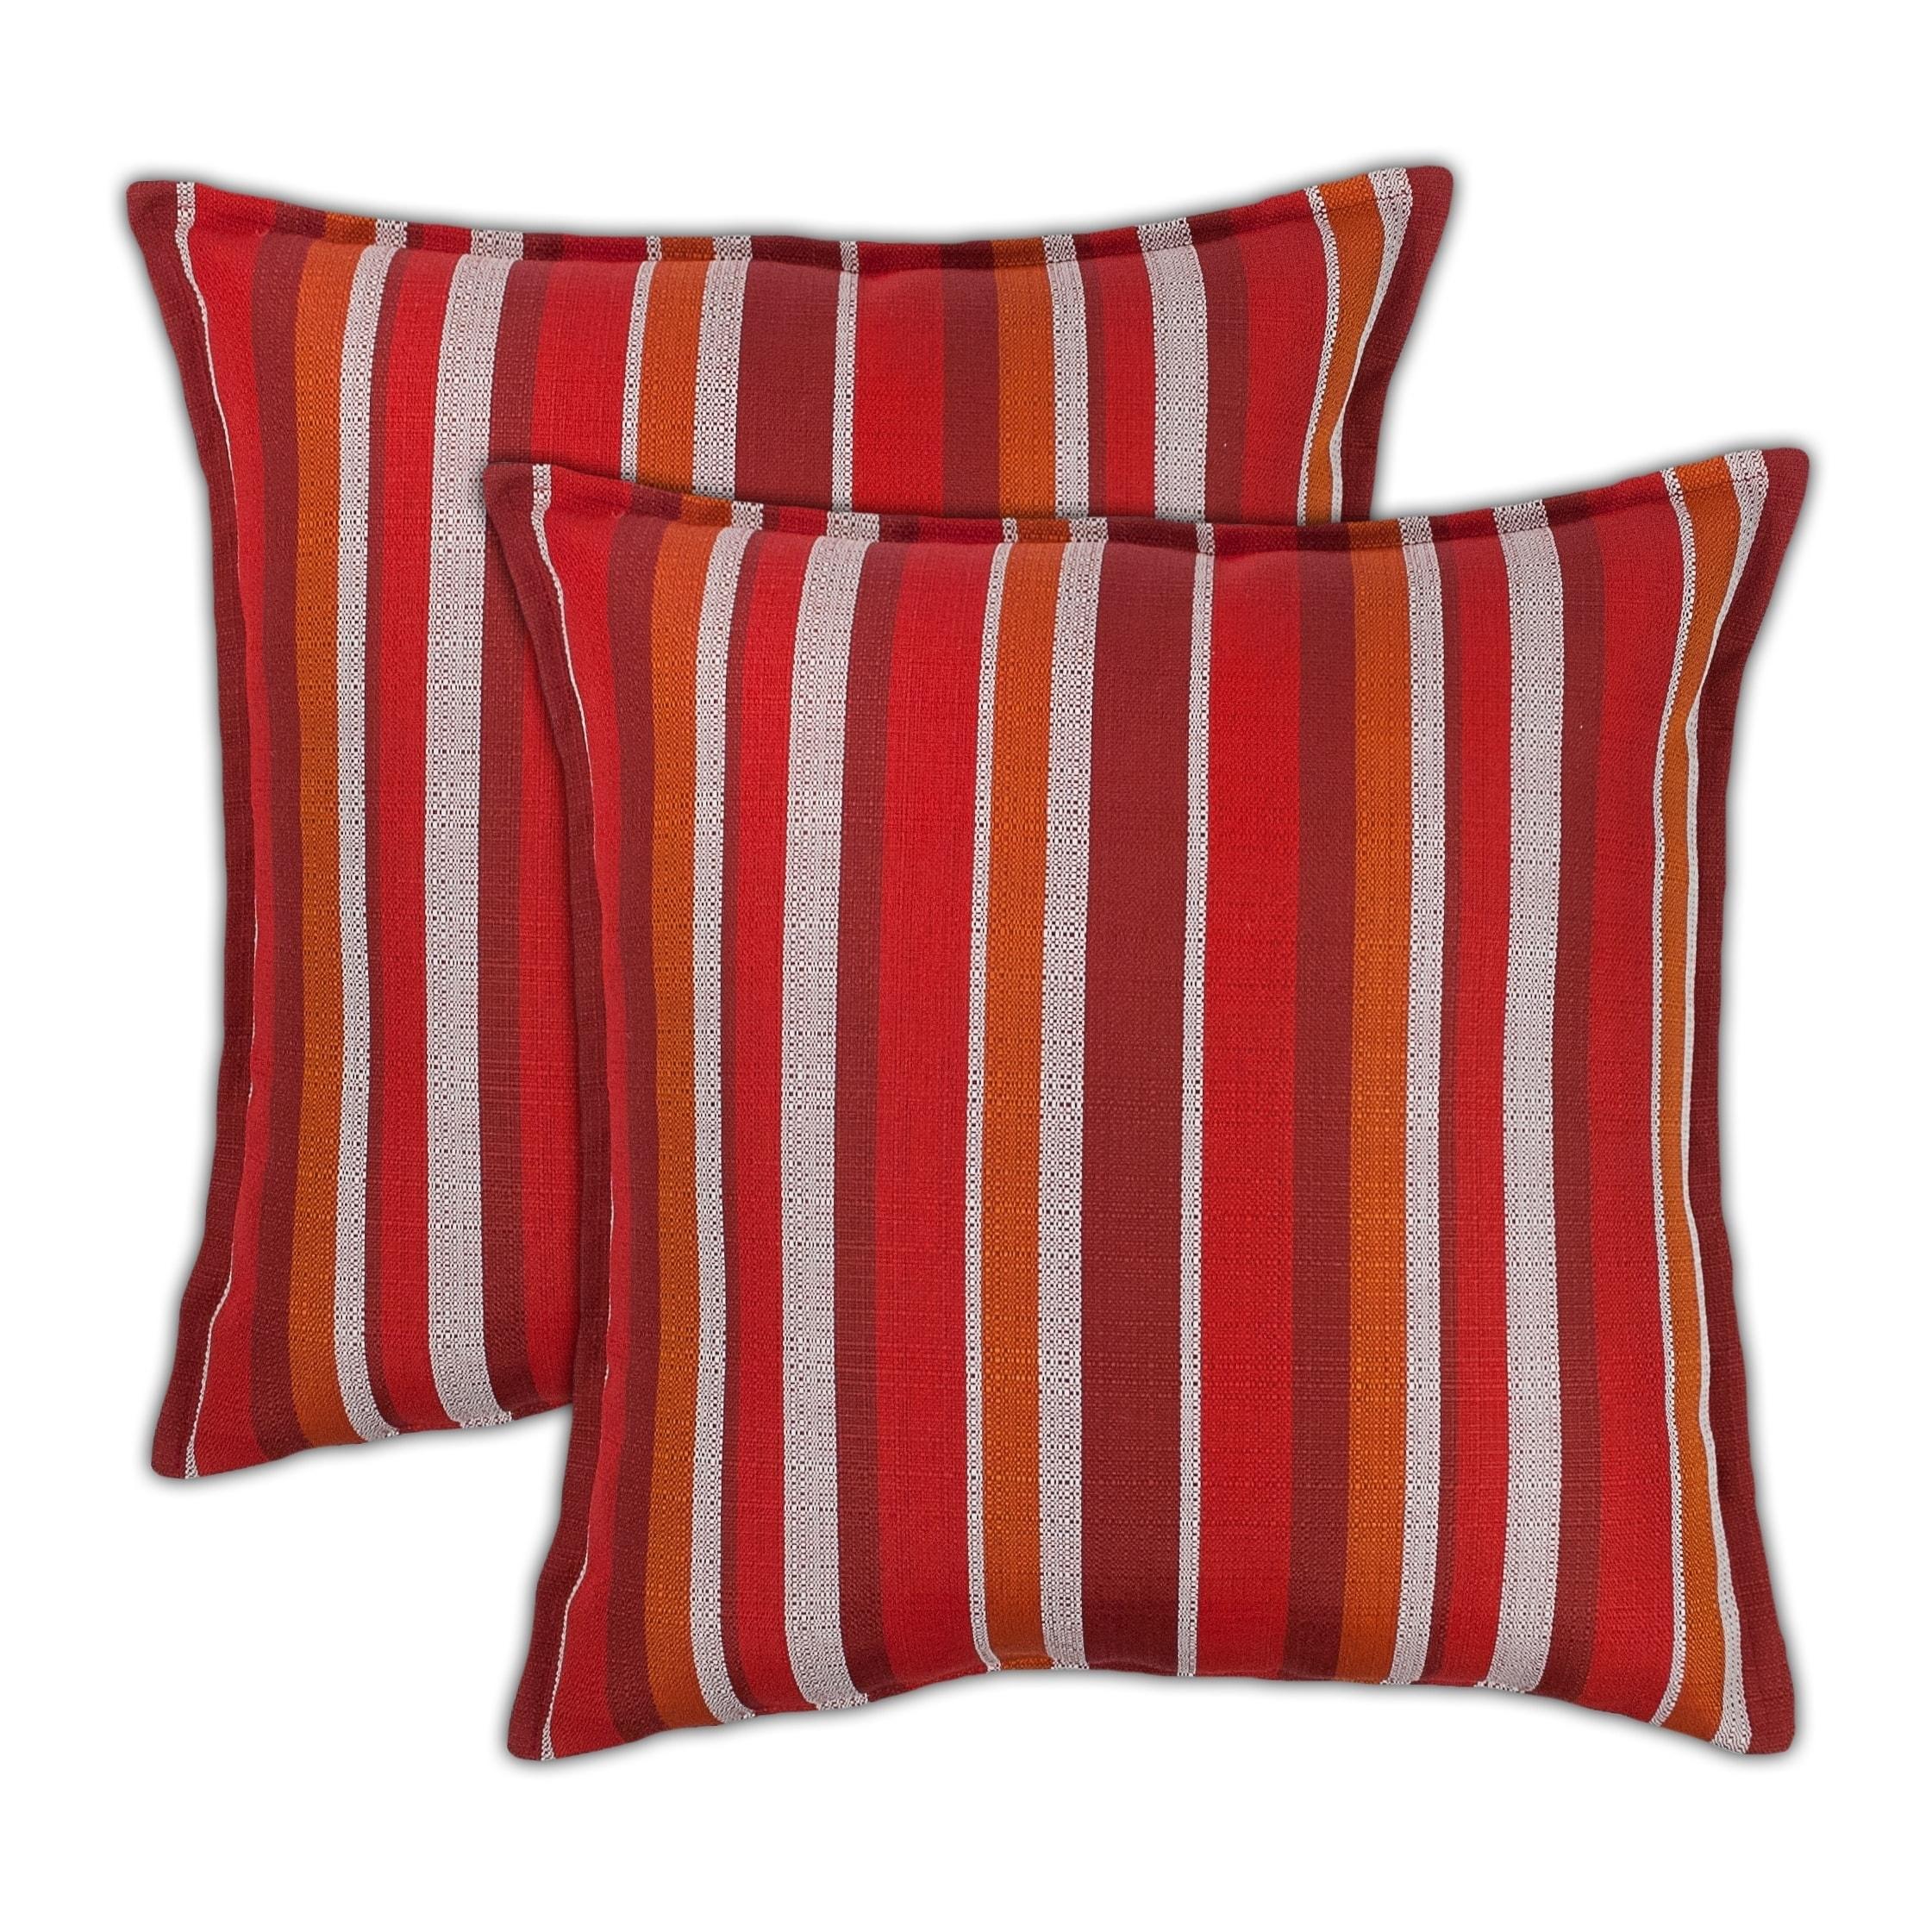 Sherry Kline Causeway 20-inch Outdoor Pillows (Set of 2) - 20 X 20